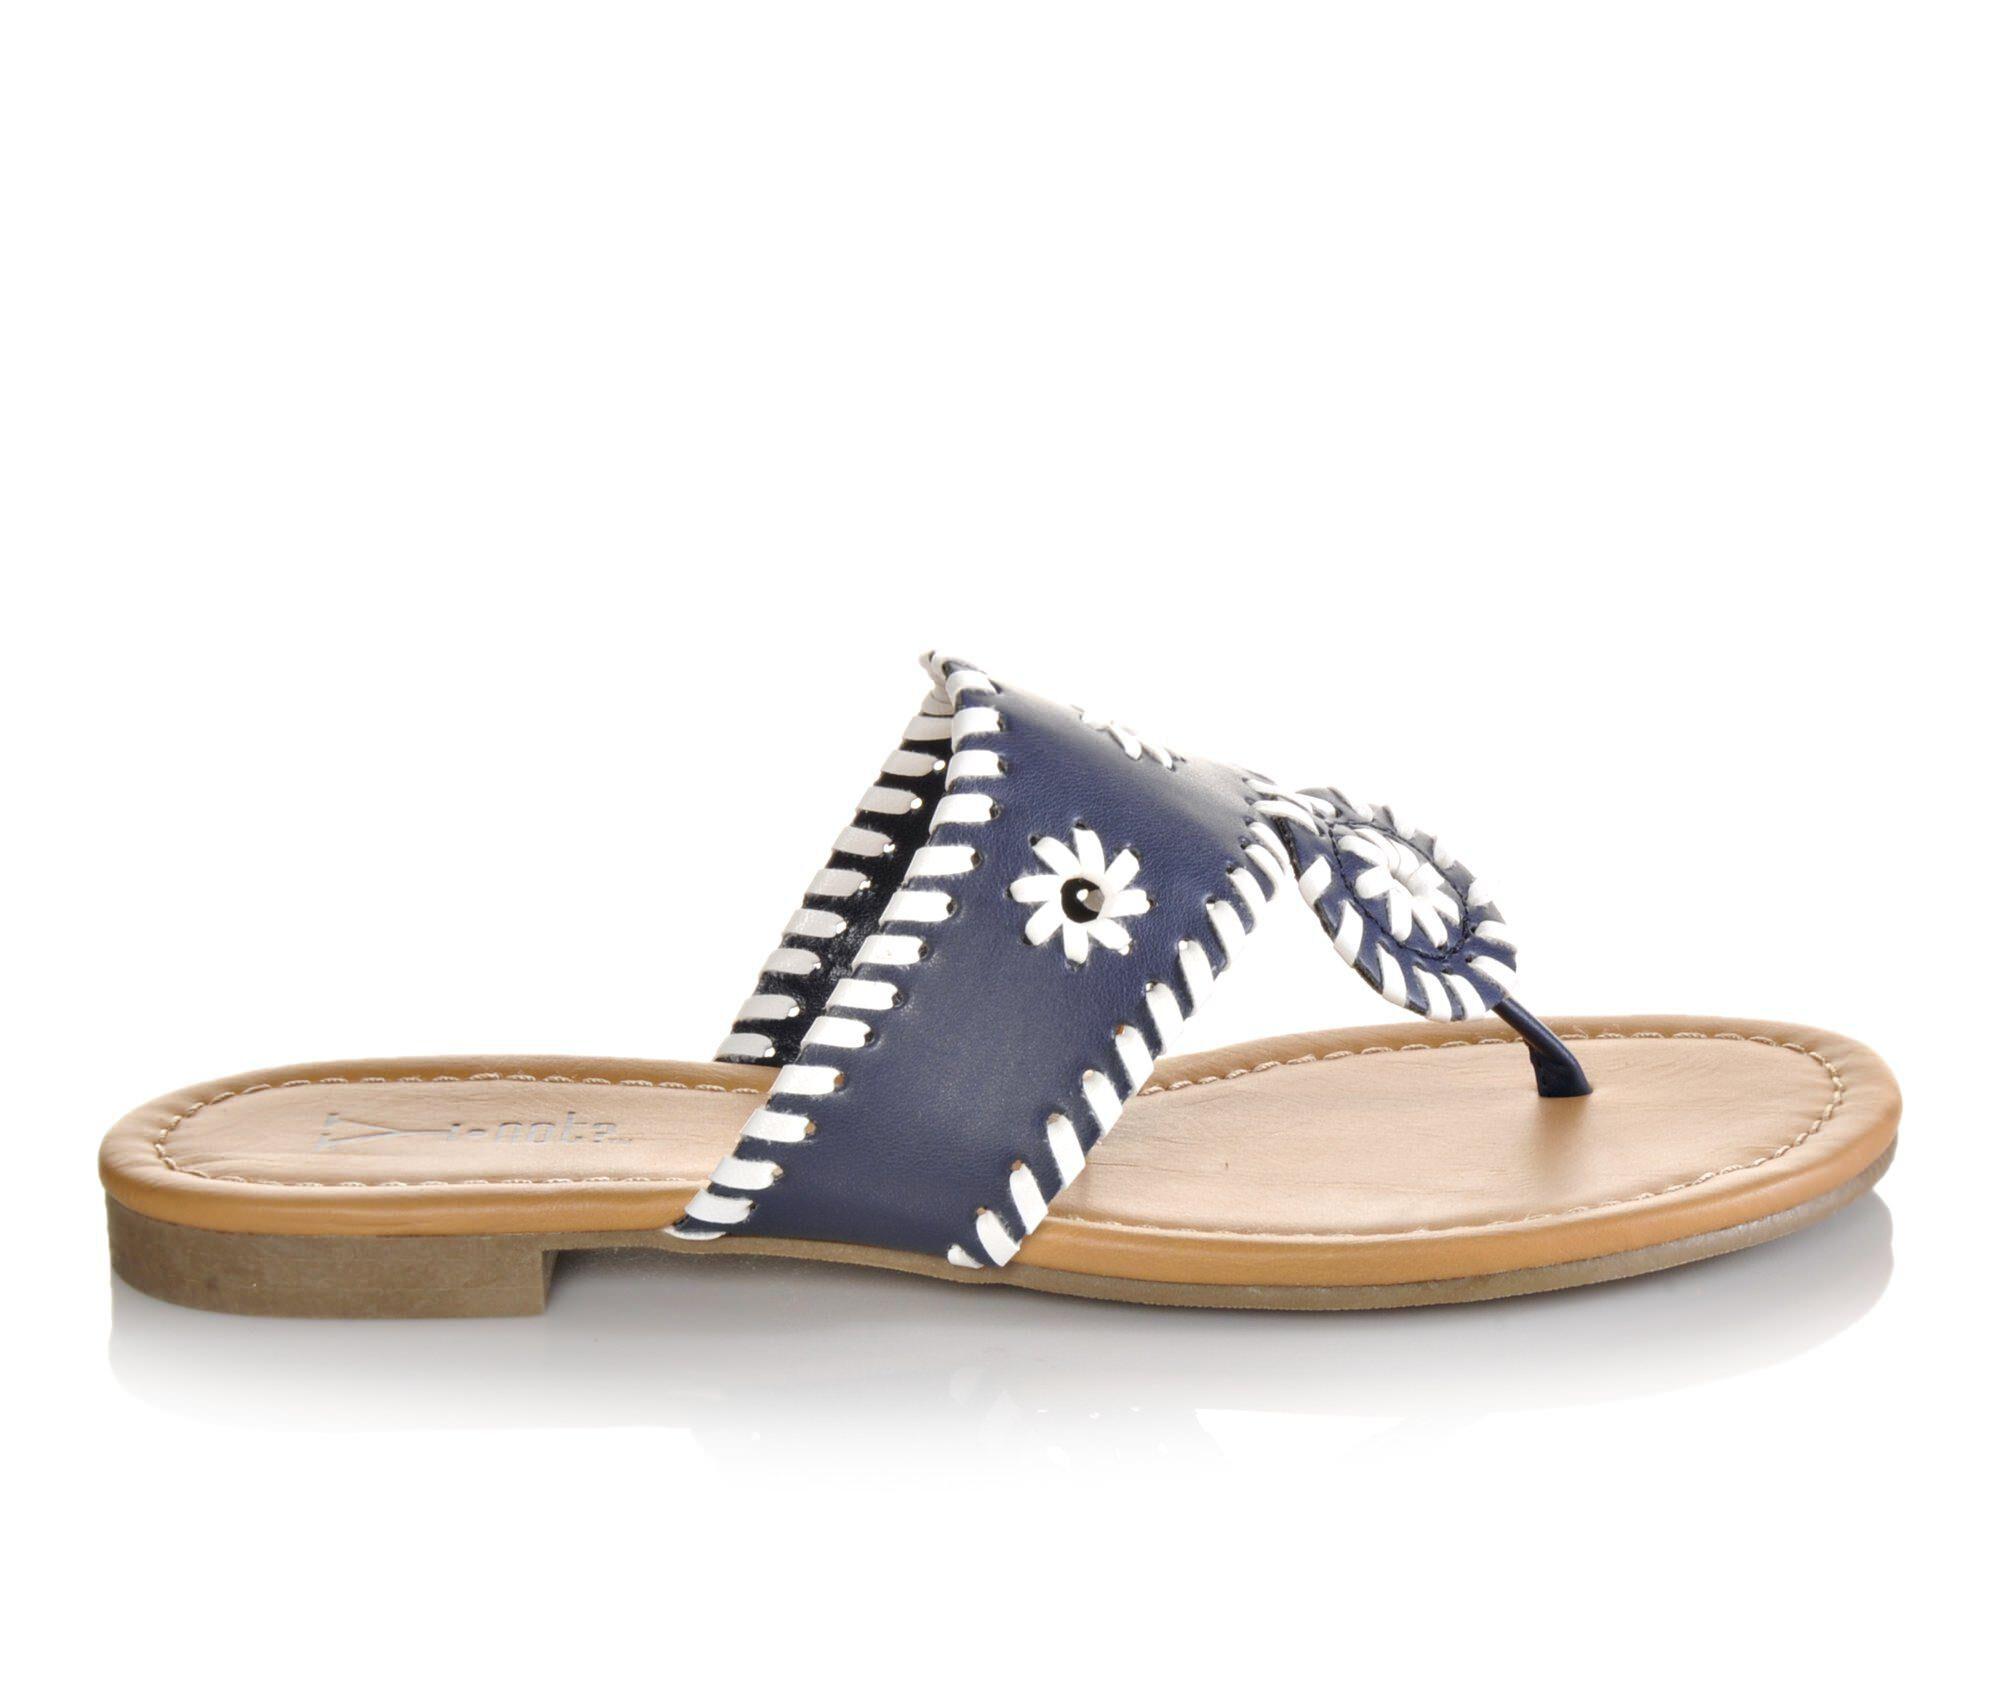 Women's Y-Not Crissy Flip-Flops Navy/White